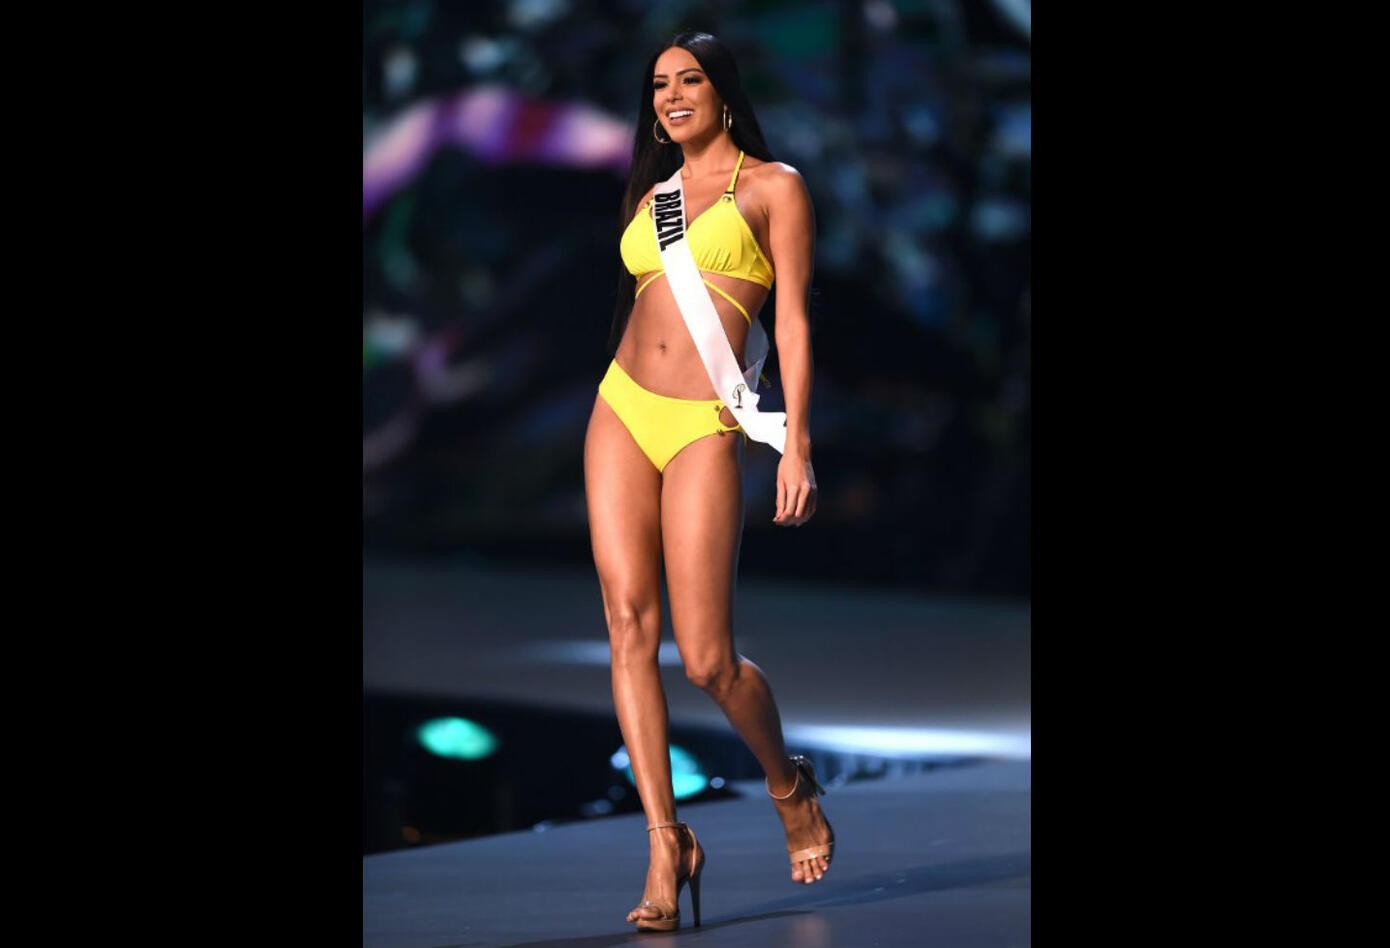 Desfile en traje de baño de Mayra Dias, Miss Brasil